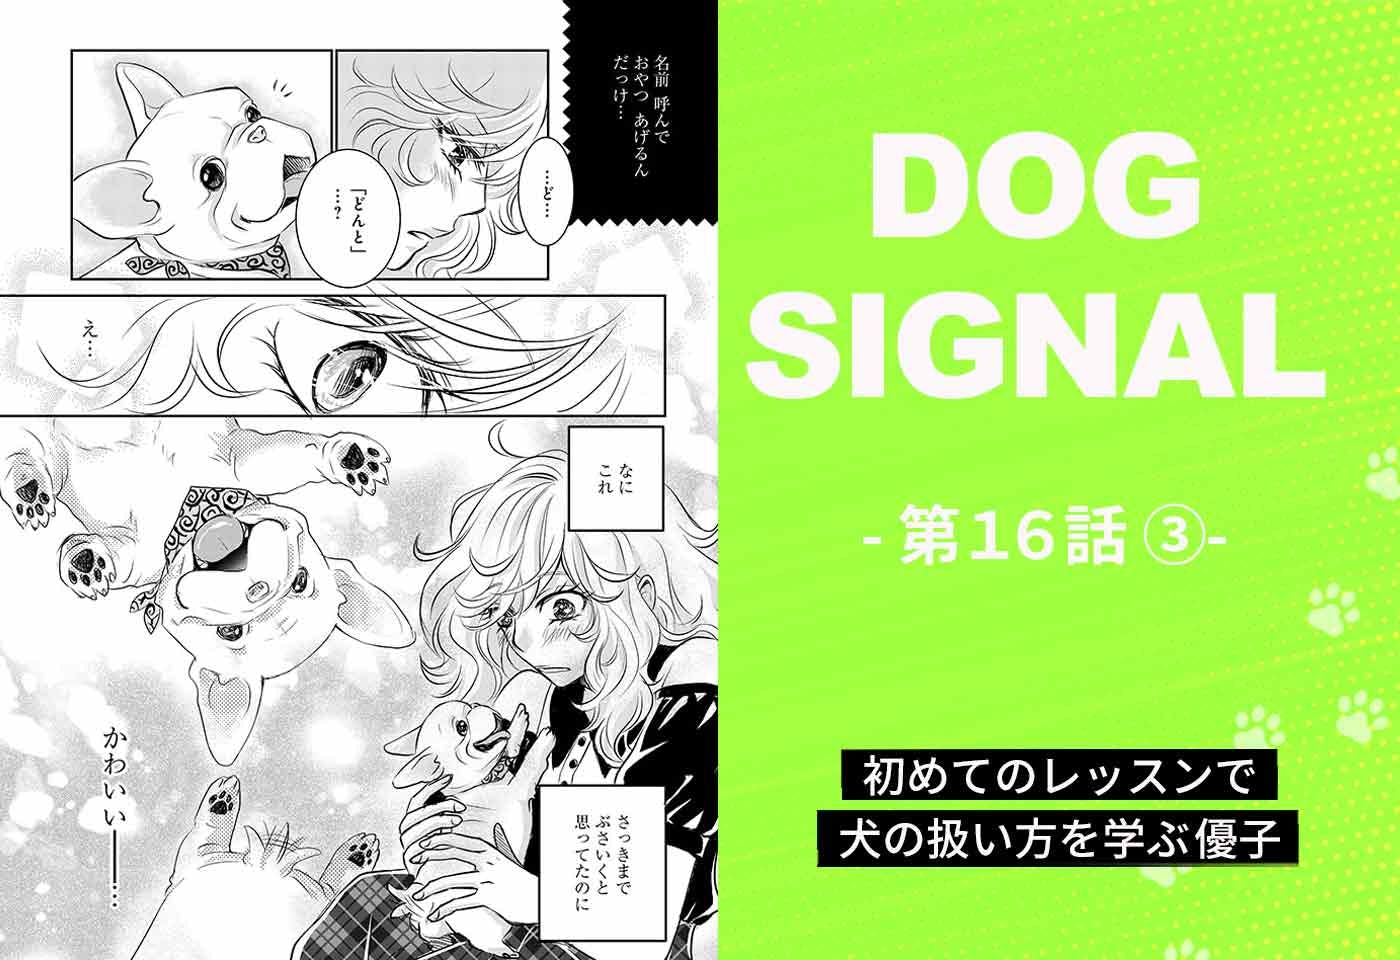 『DOG SIGNAL』16話目 3/4